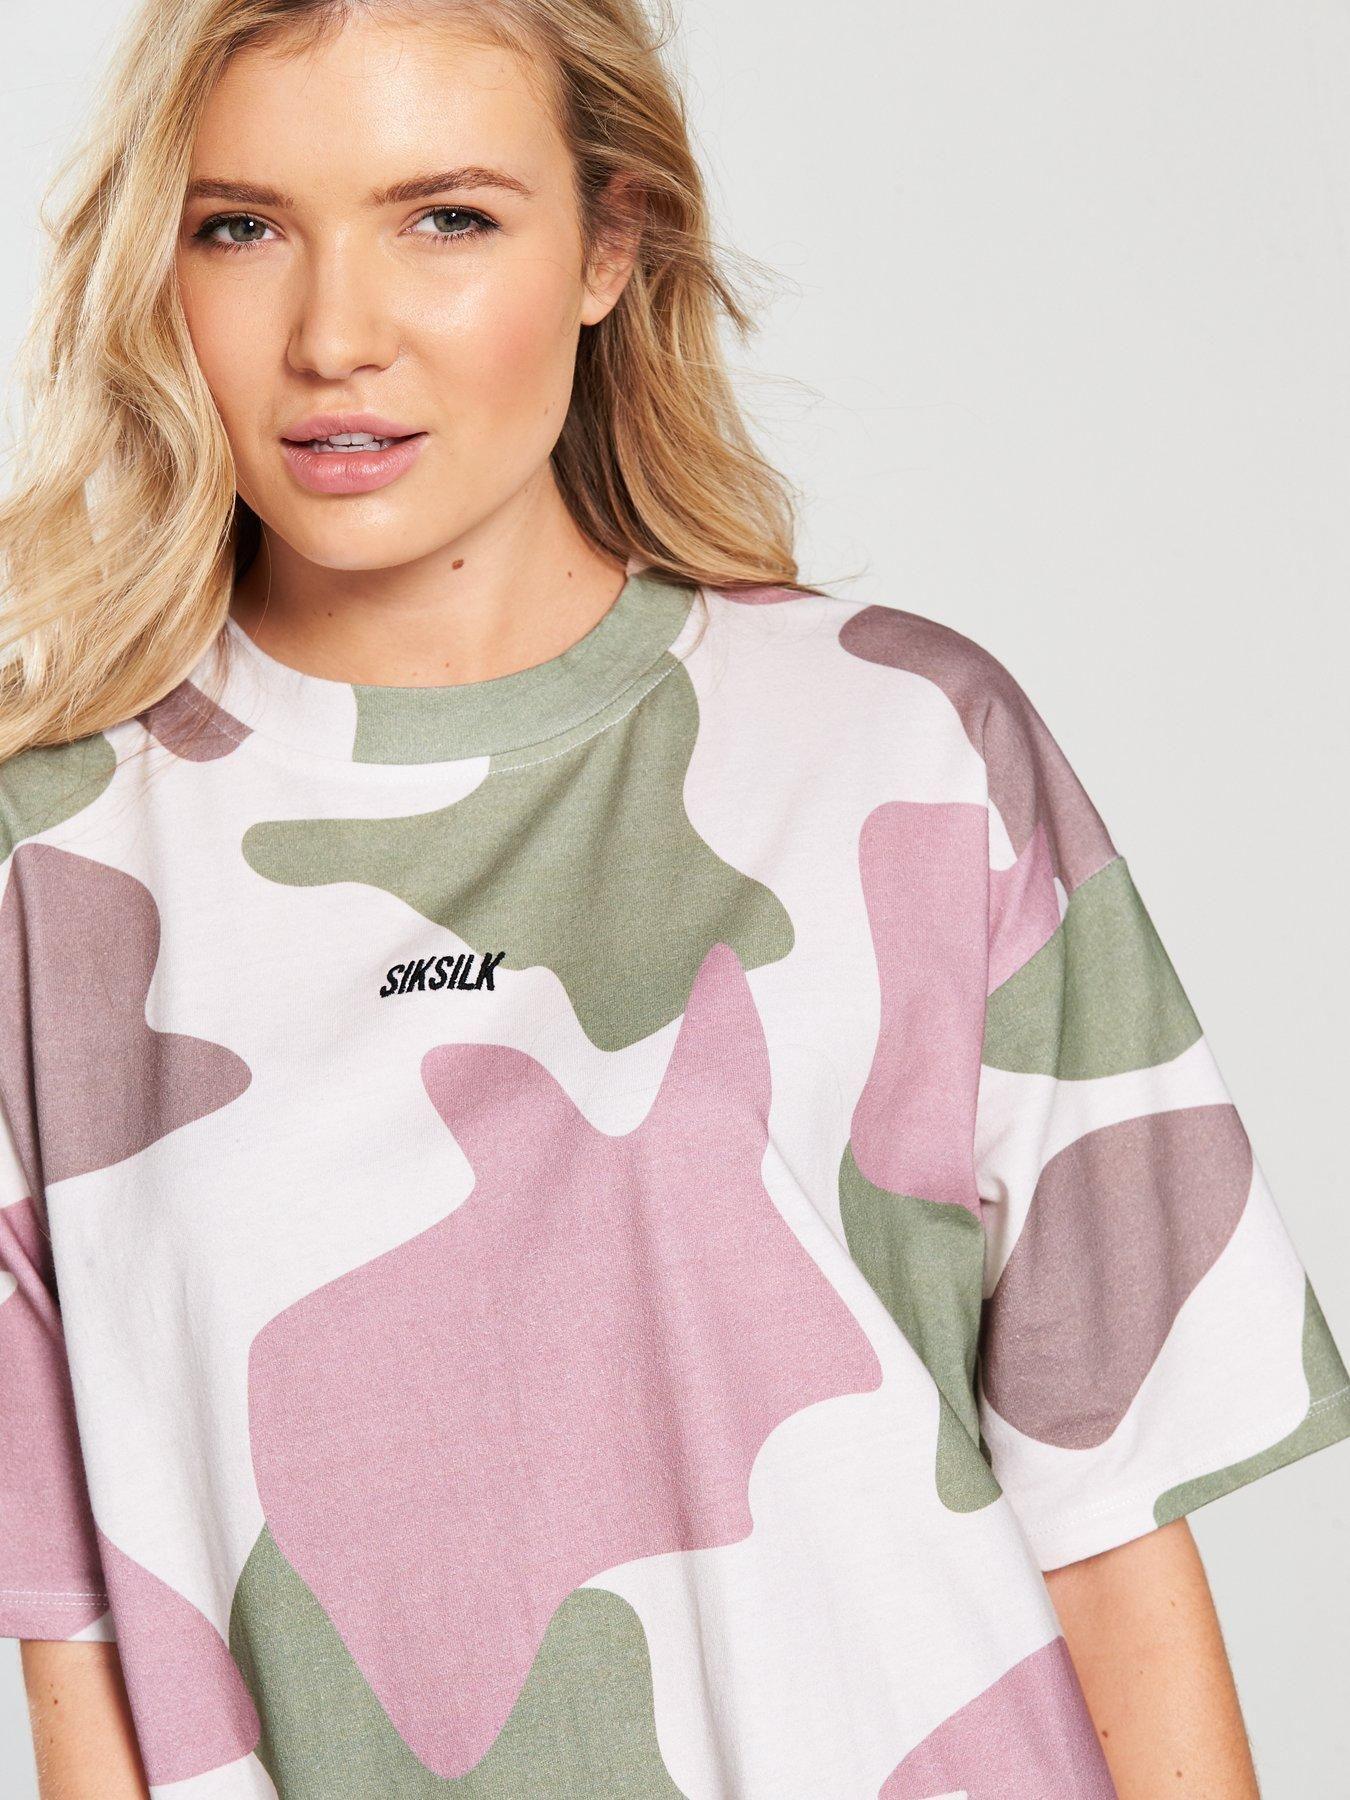 Image result for womens tshirt dress prints pinterest